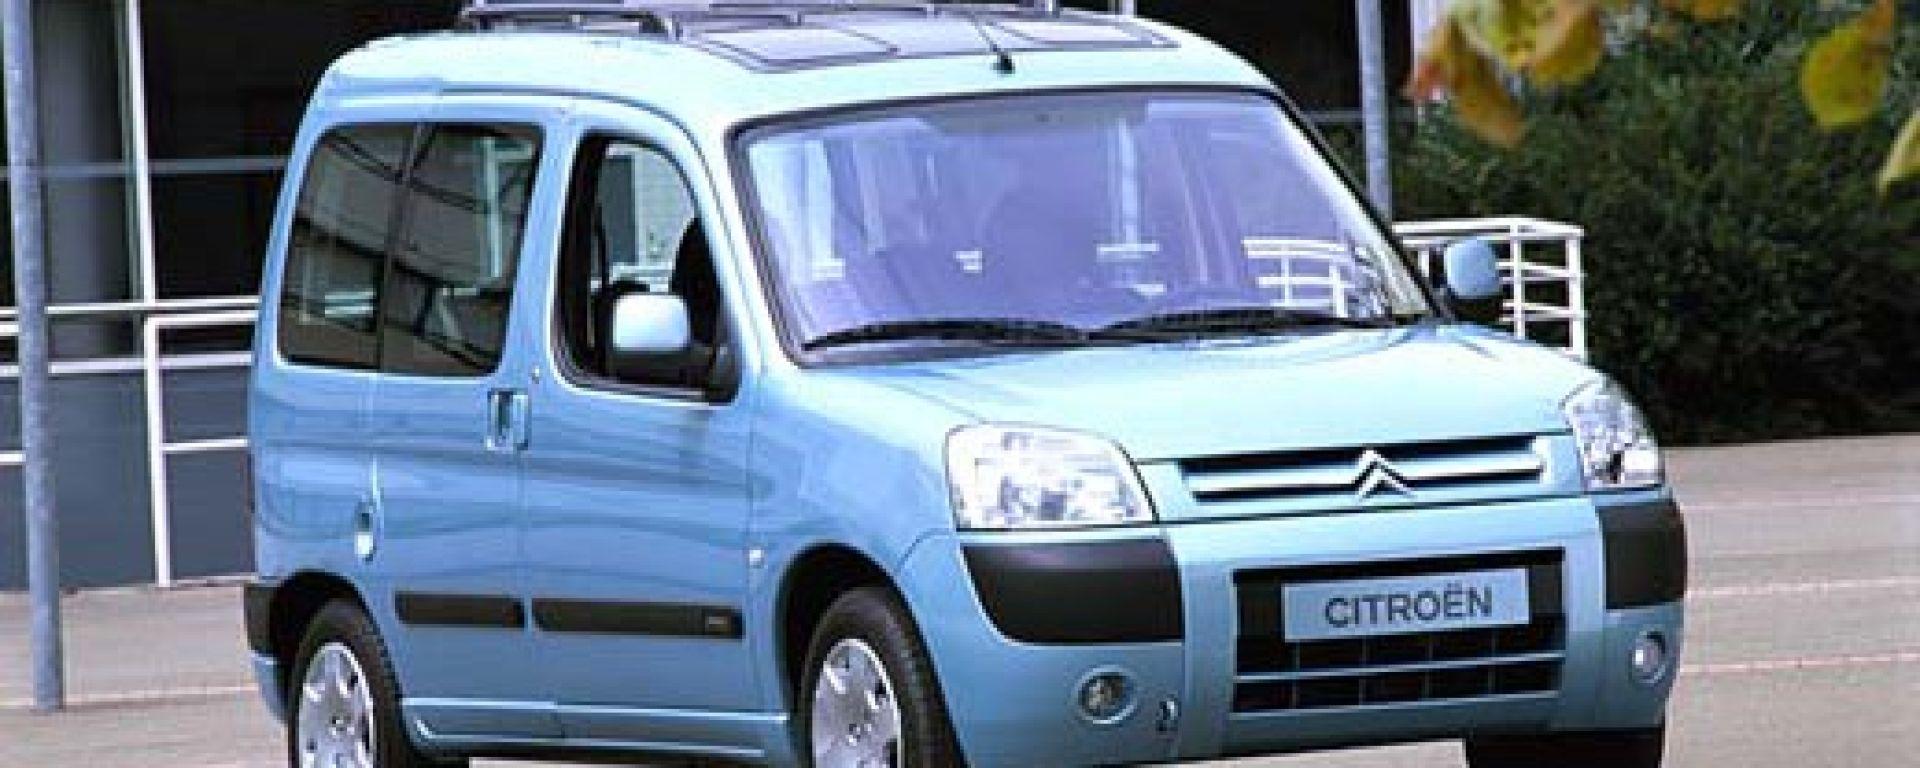 Citroën Berlingo my 2003